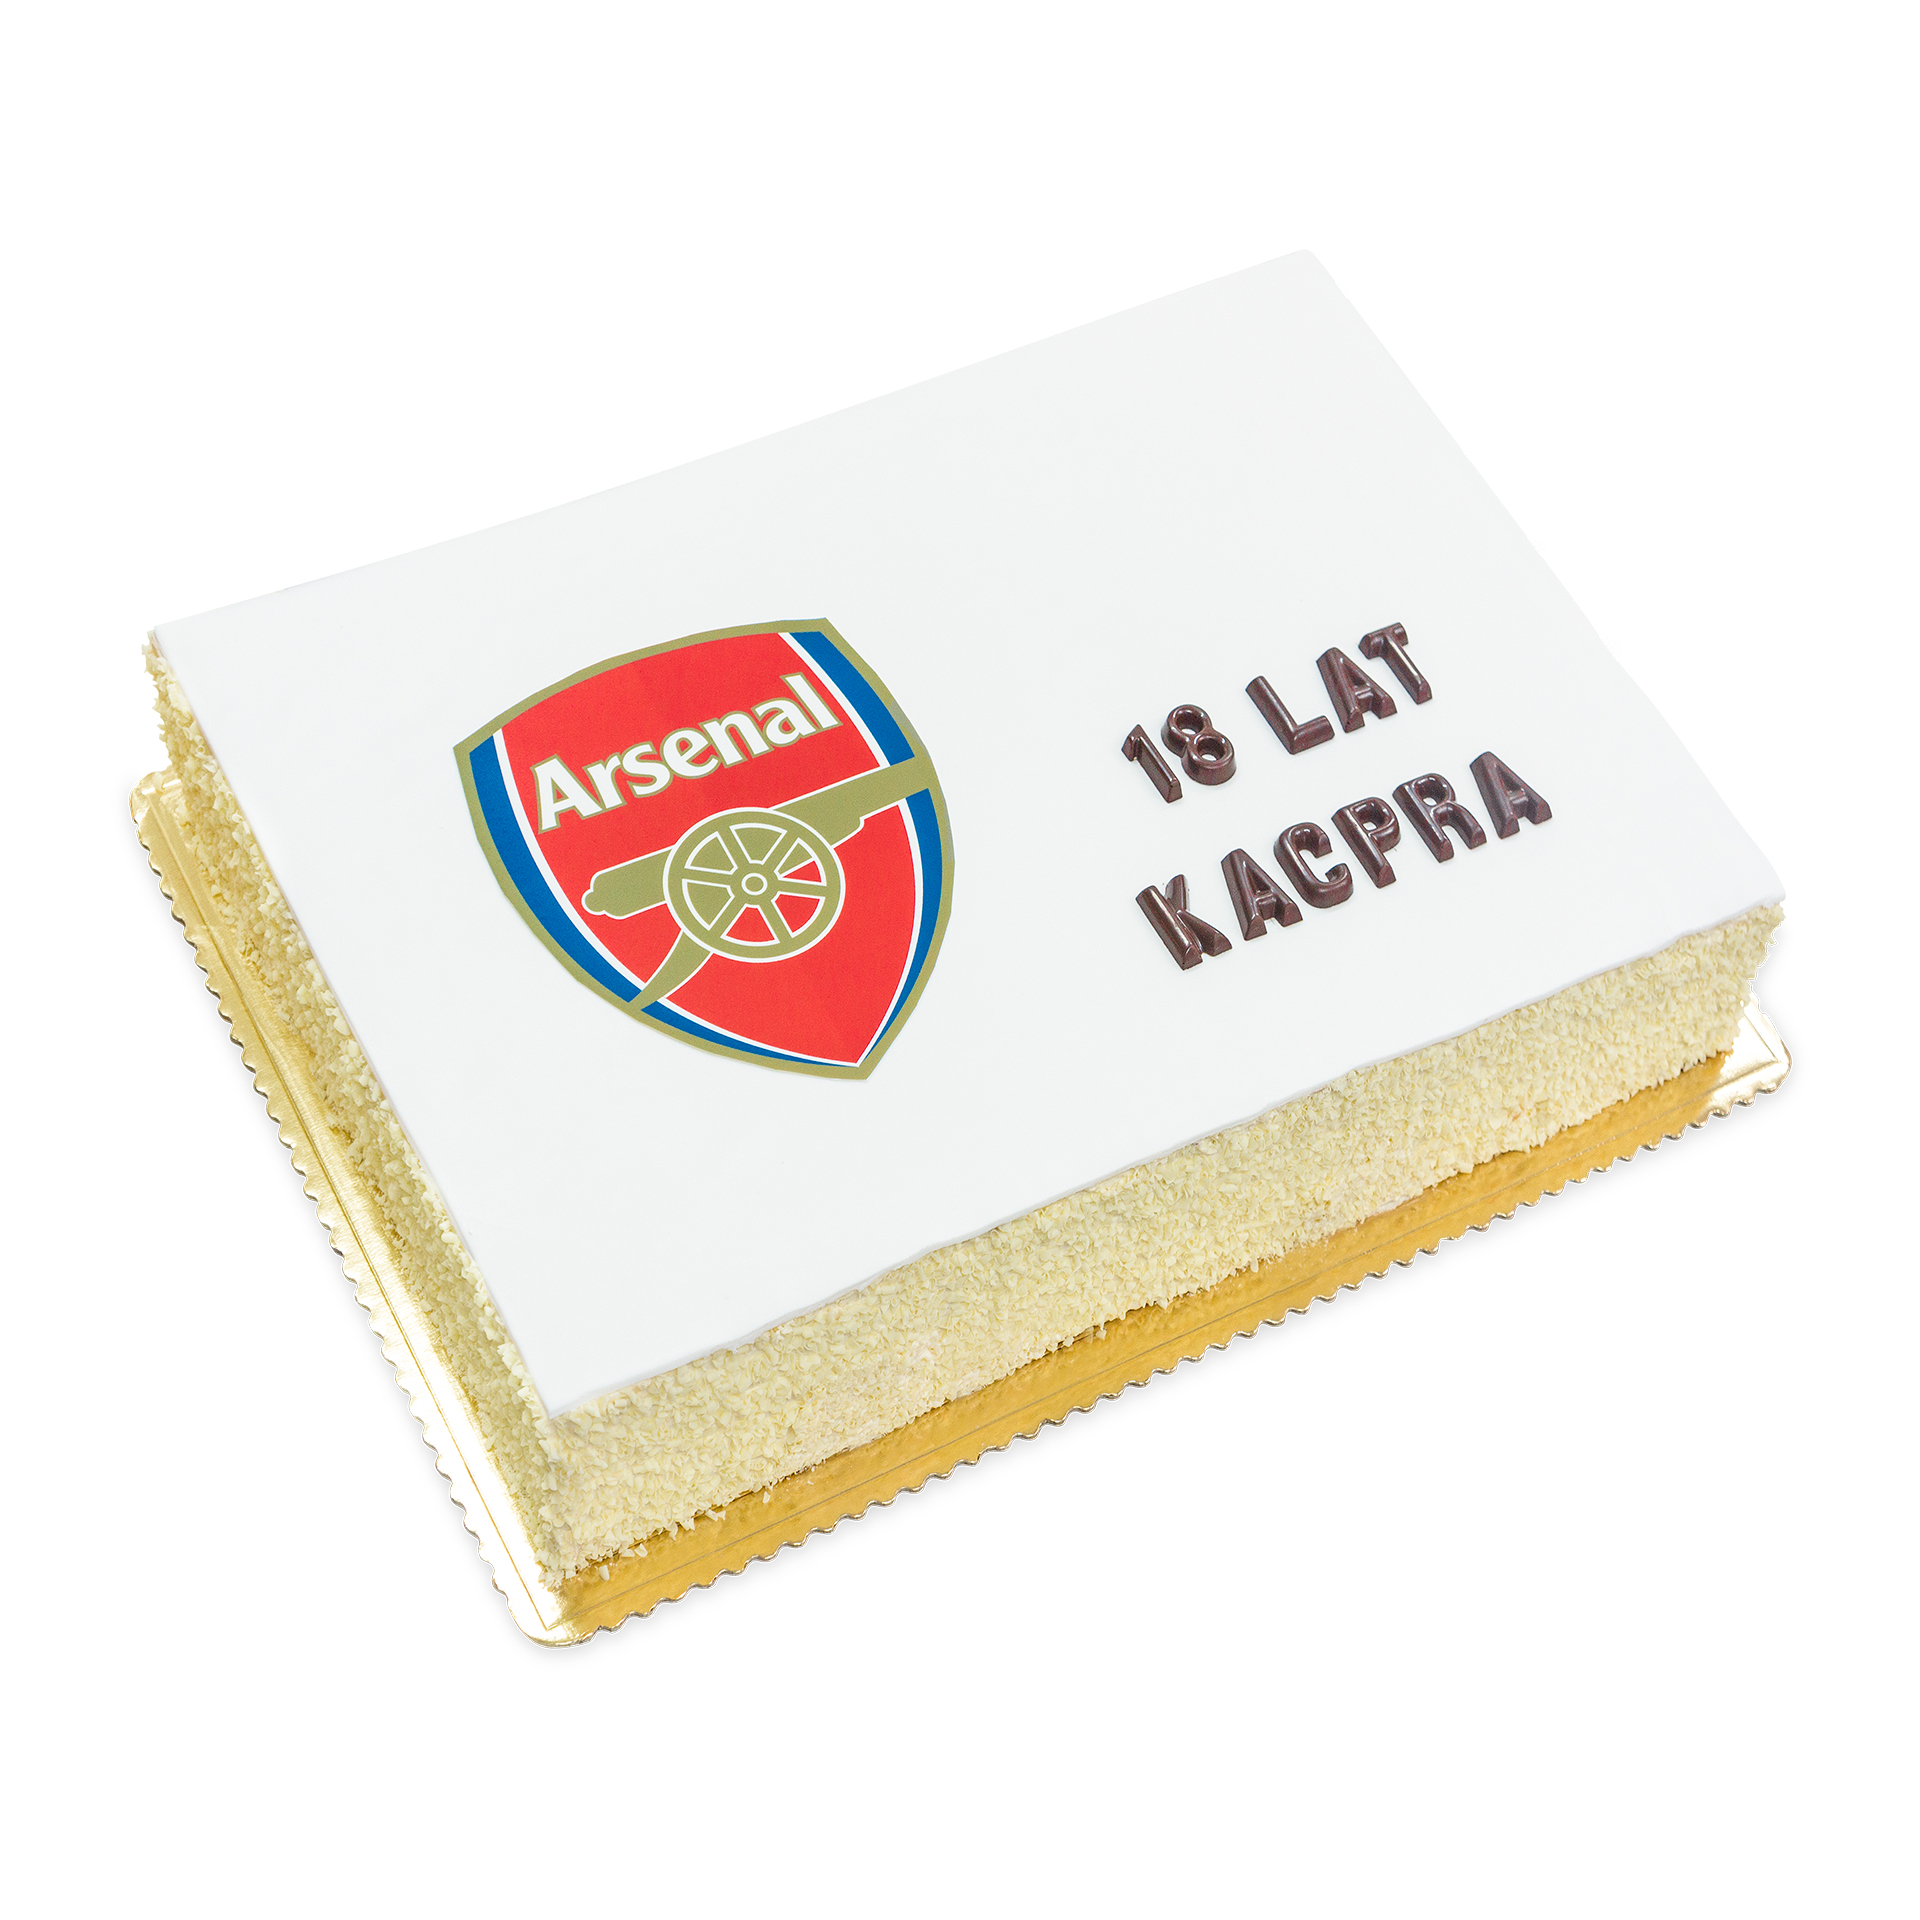 tort arsenal, tort na osiemnastke duzy